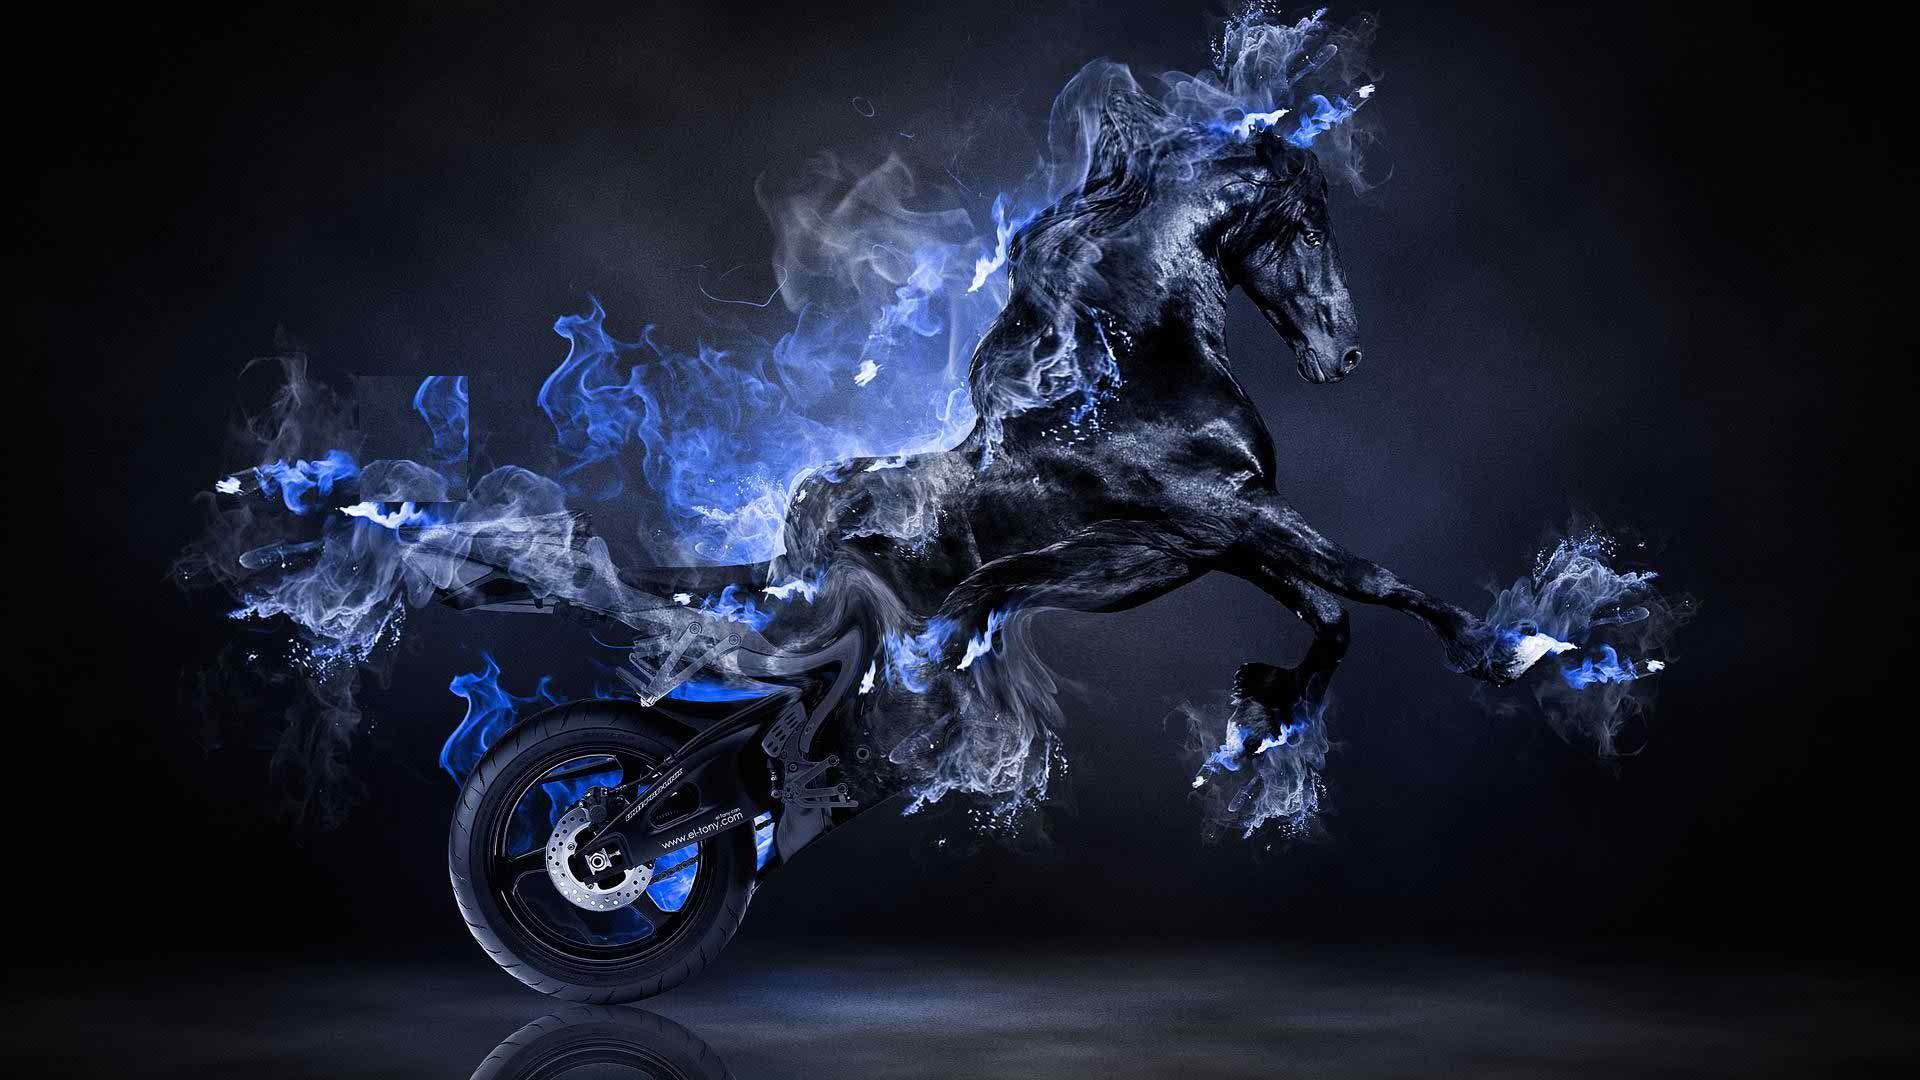 Blue Fire Desktop Wallpapers